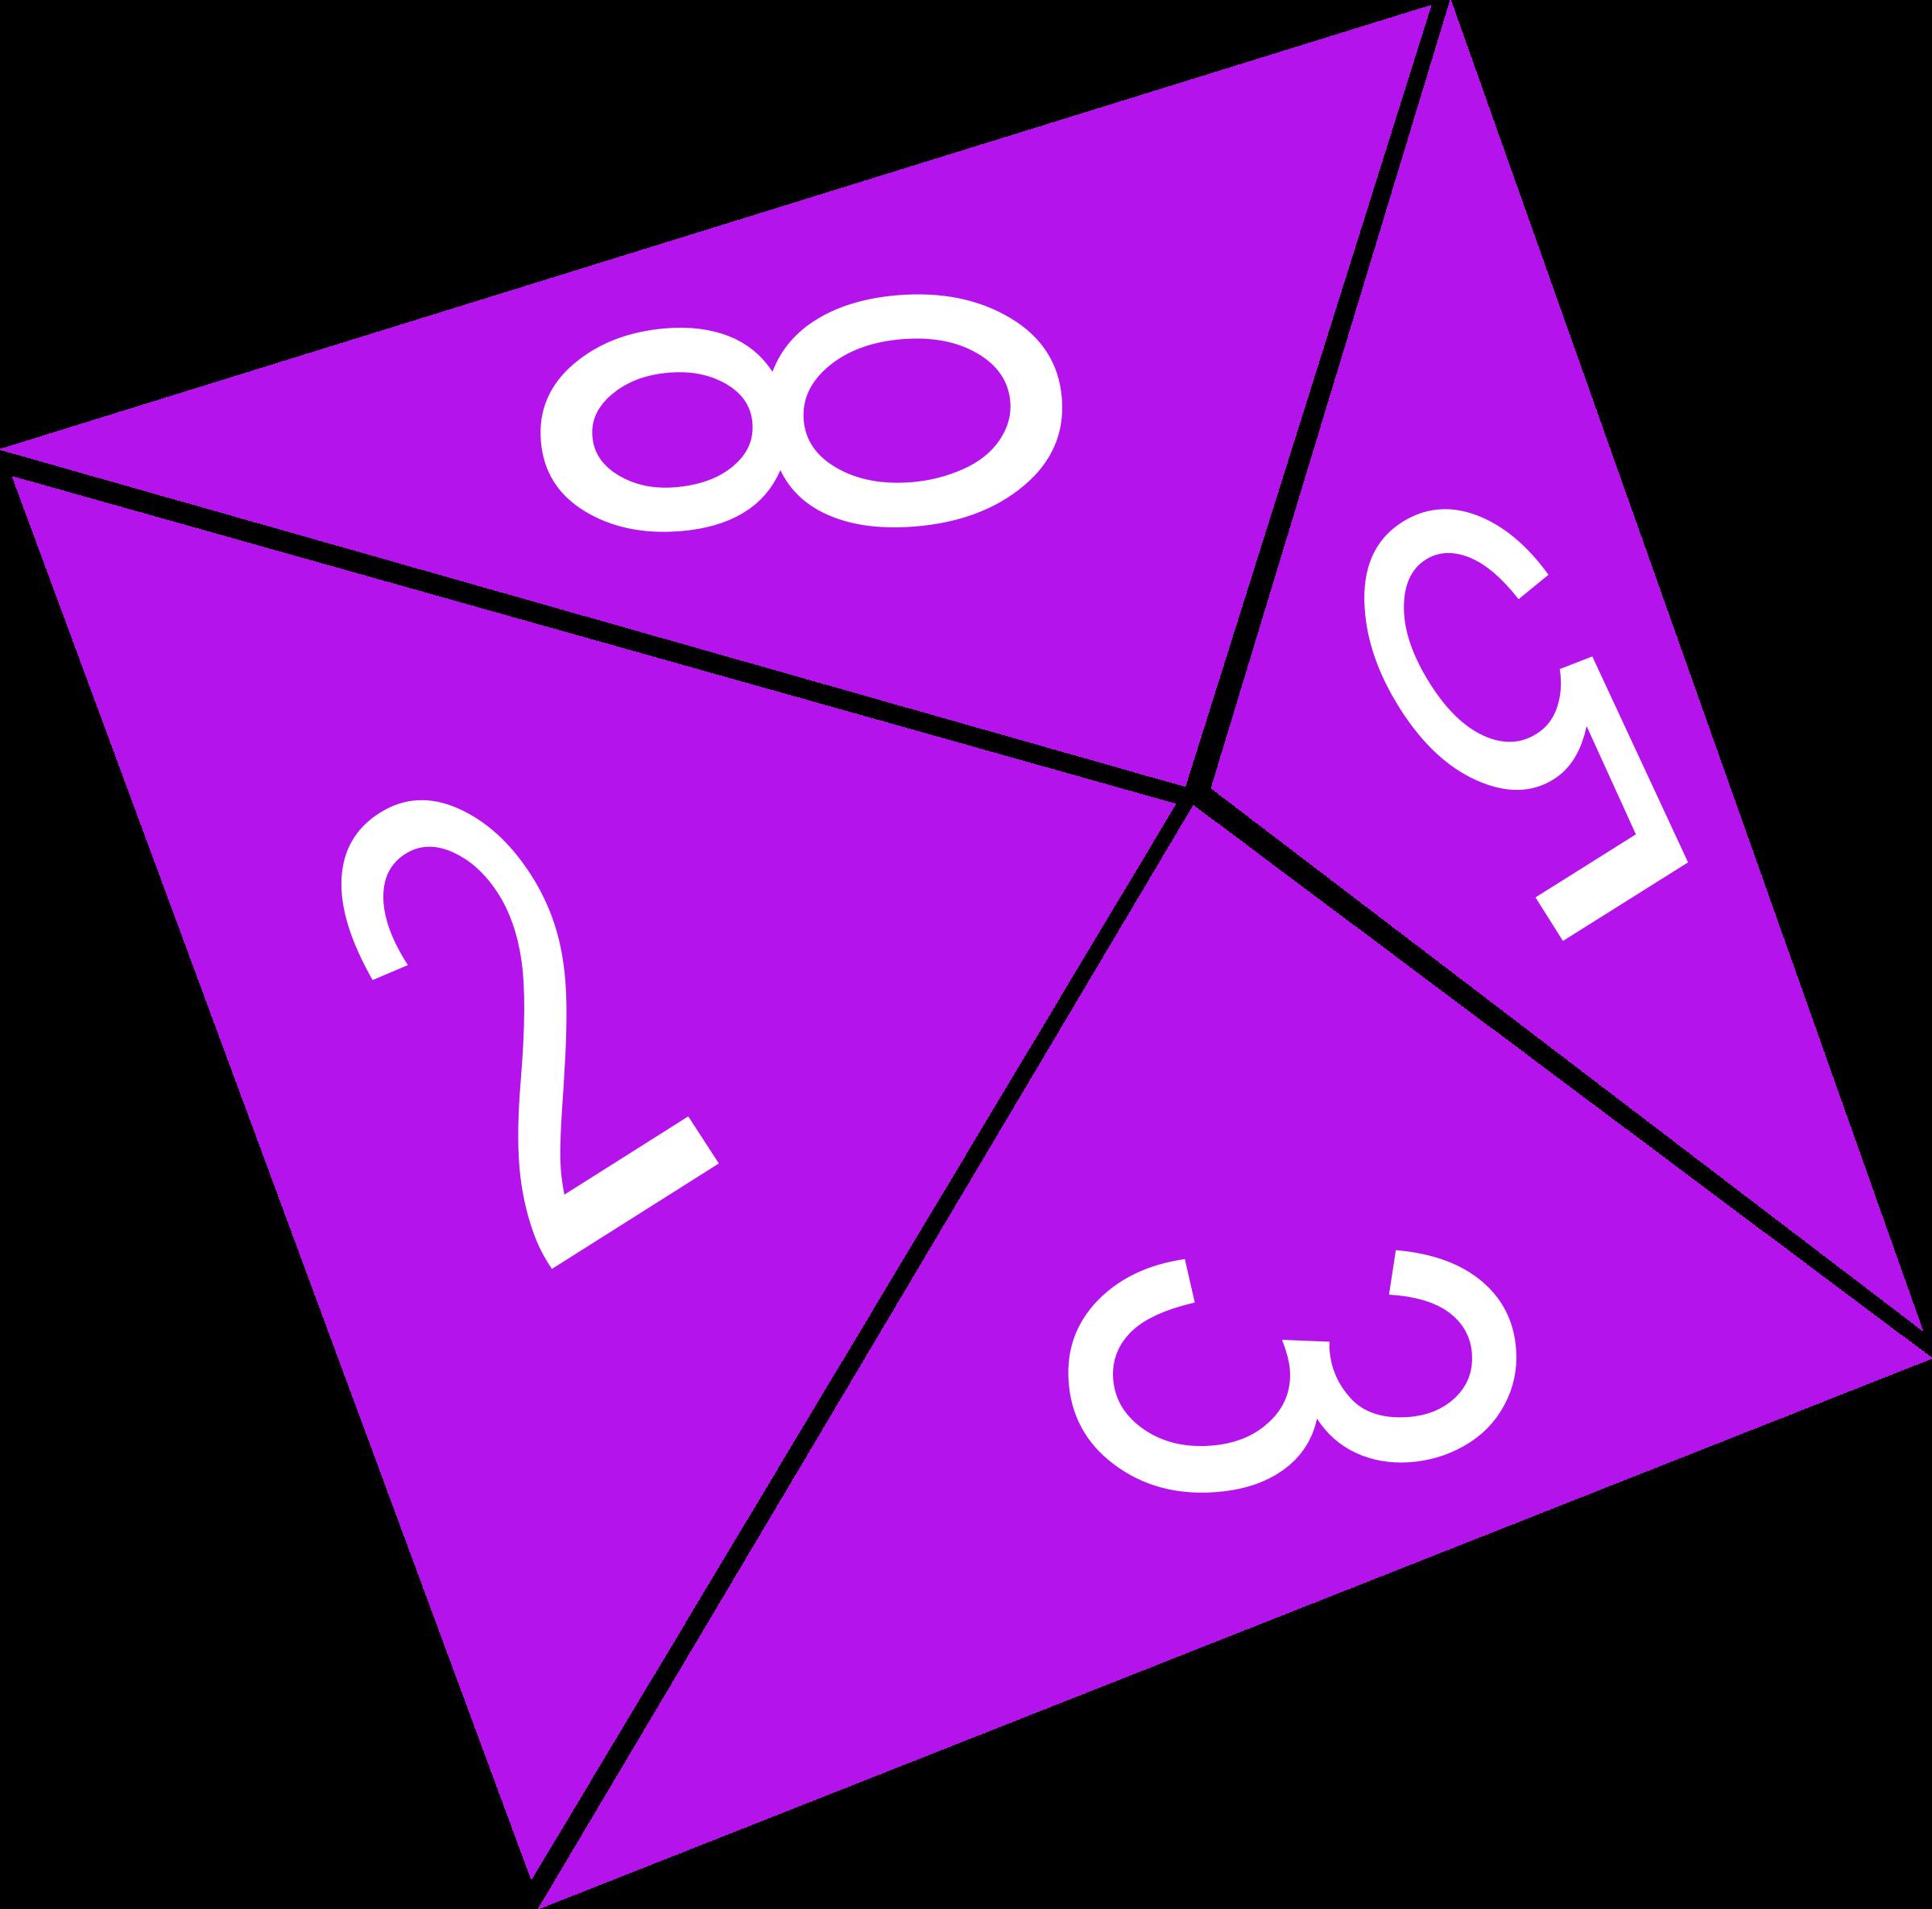 Dice clipart purple Clipart — Clipartwork Clipart Dice